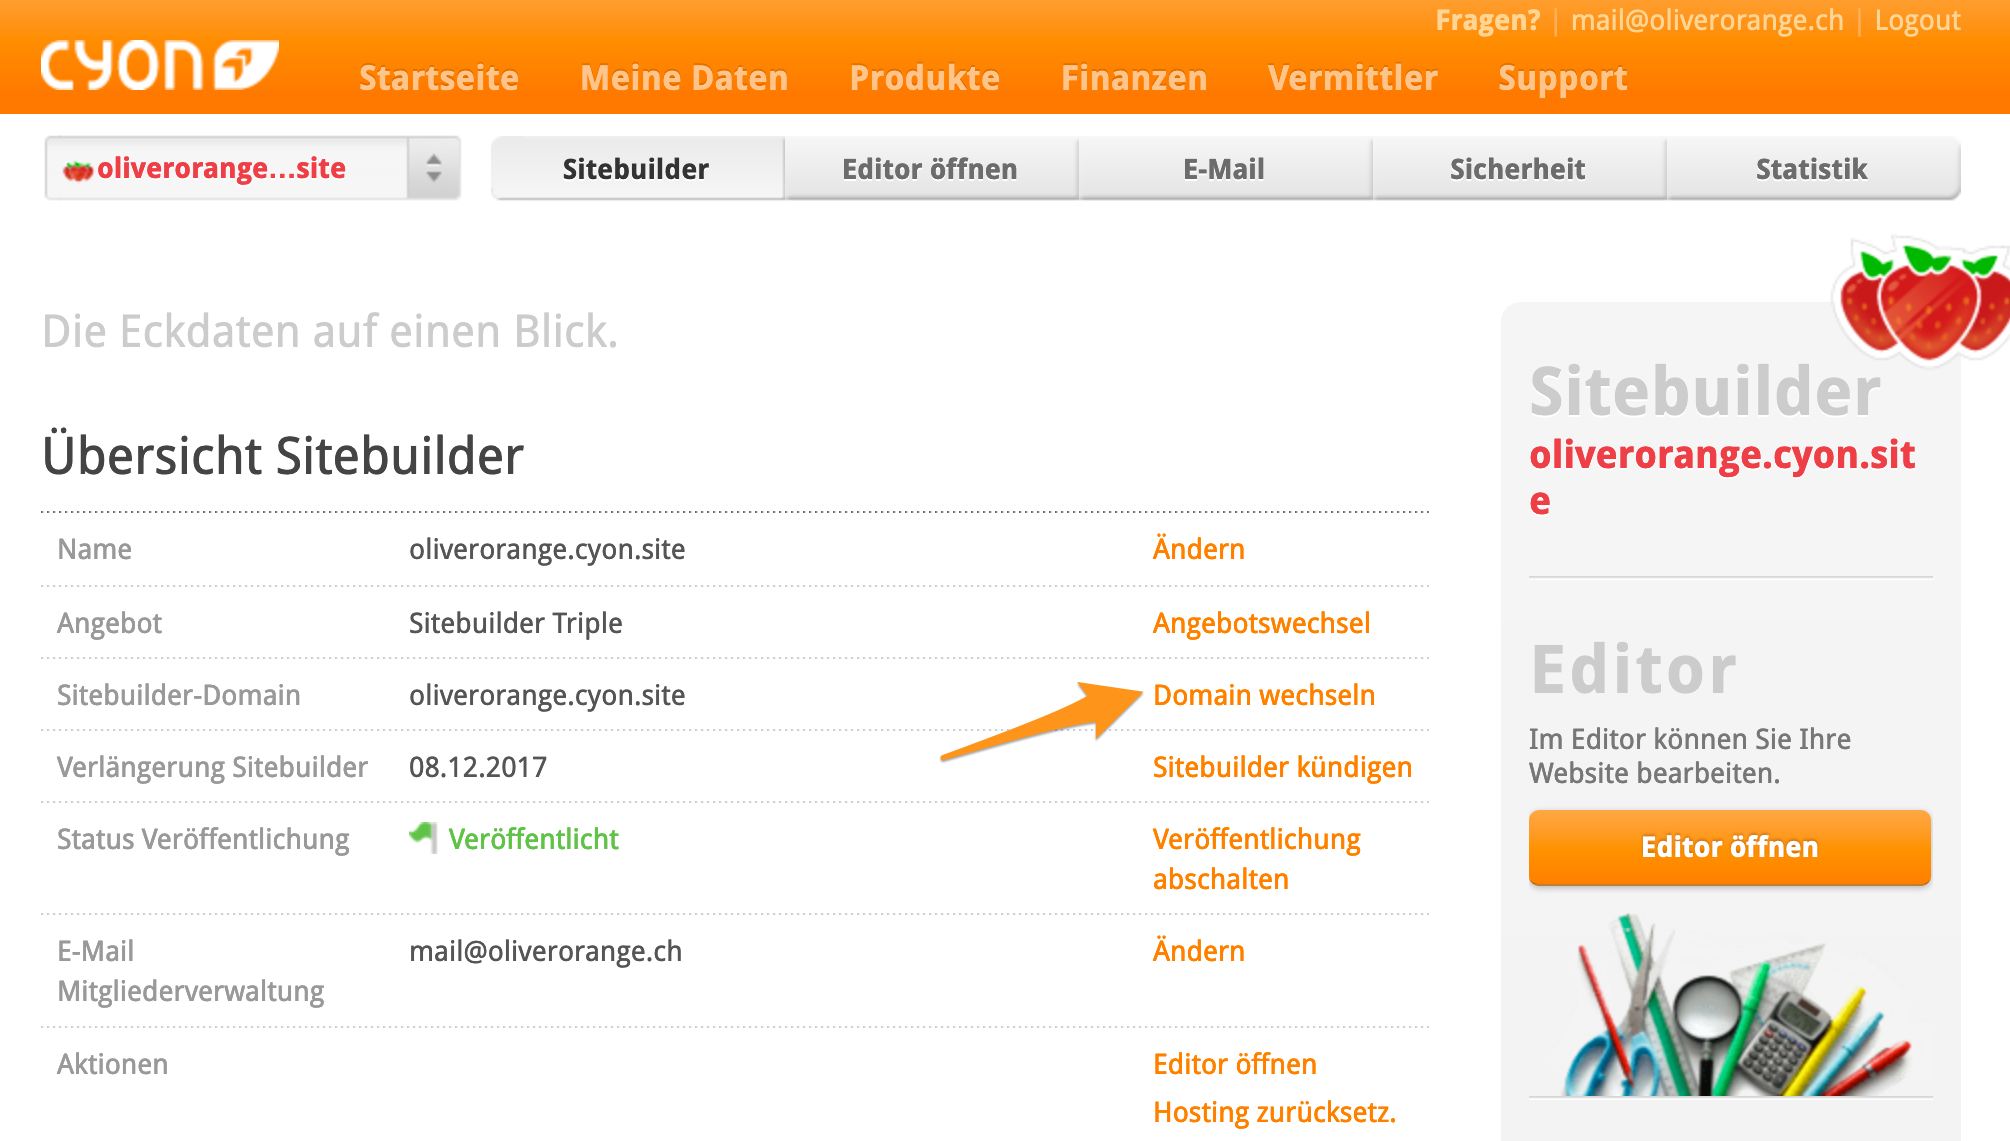 Sitebuilder-Domain ersetzten